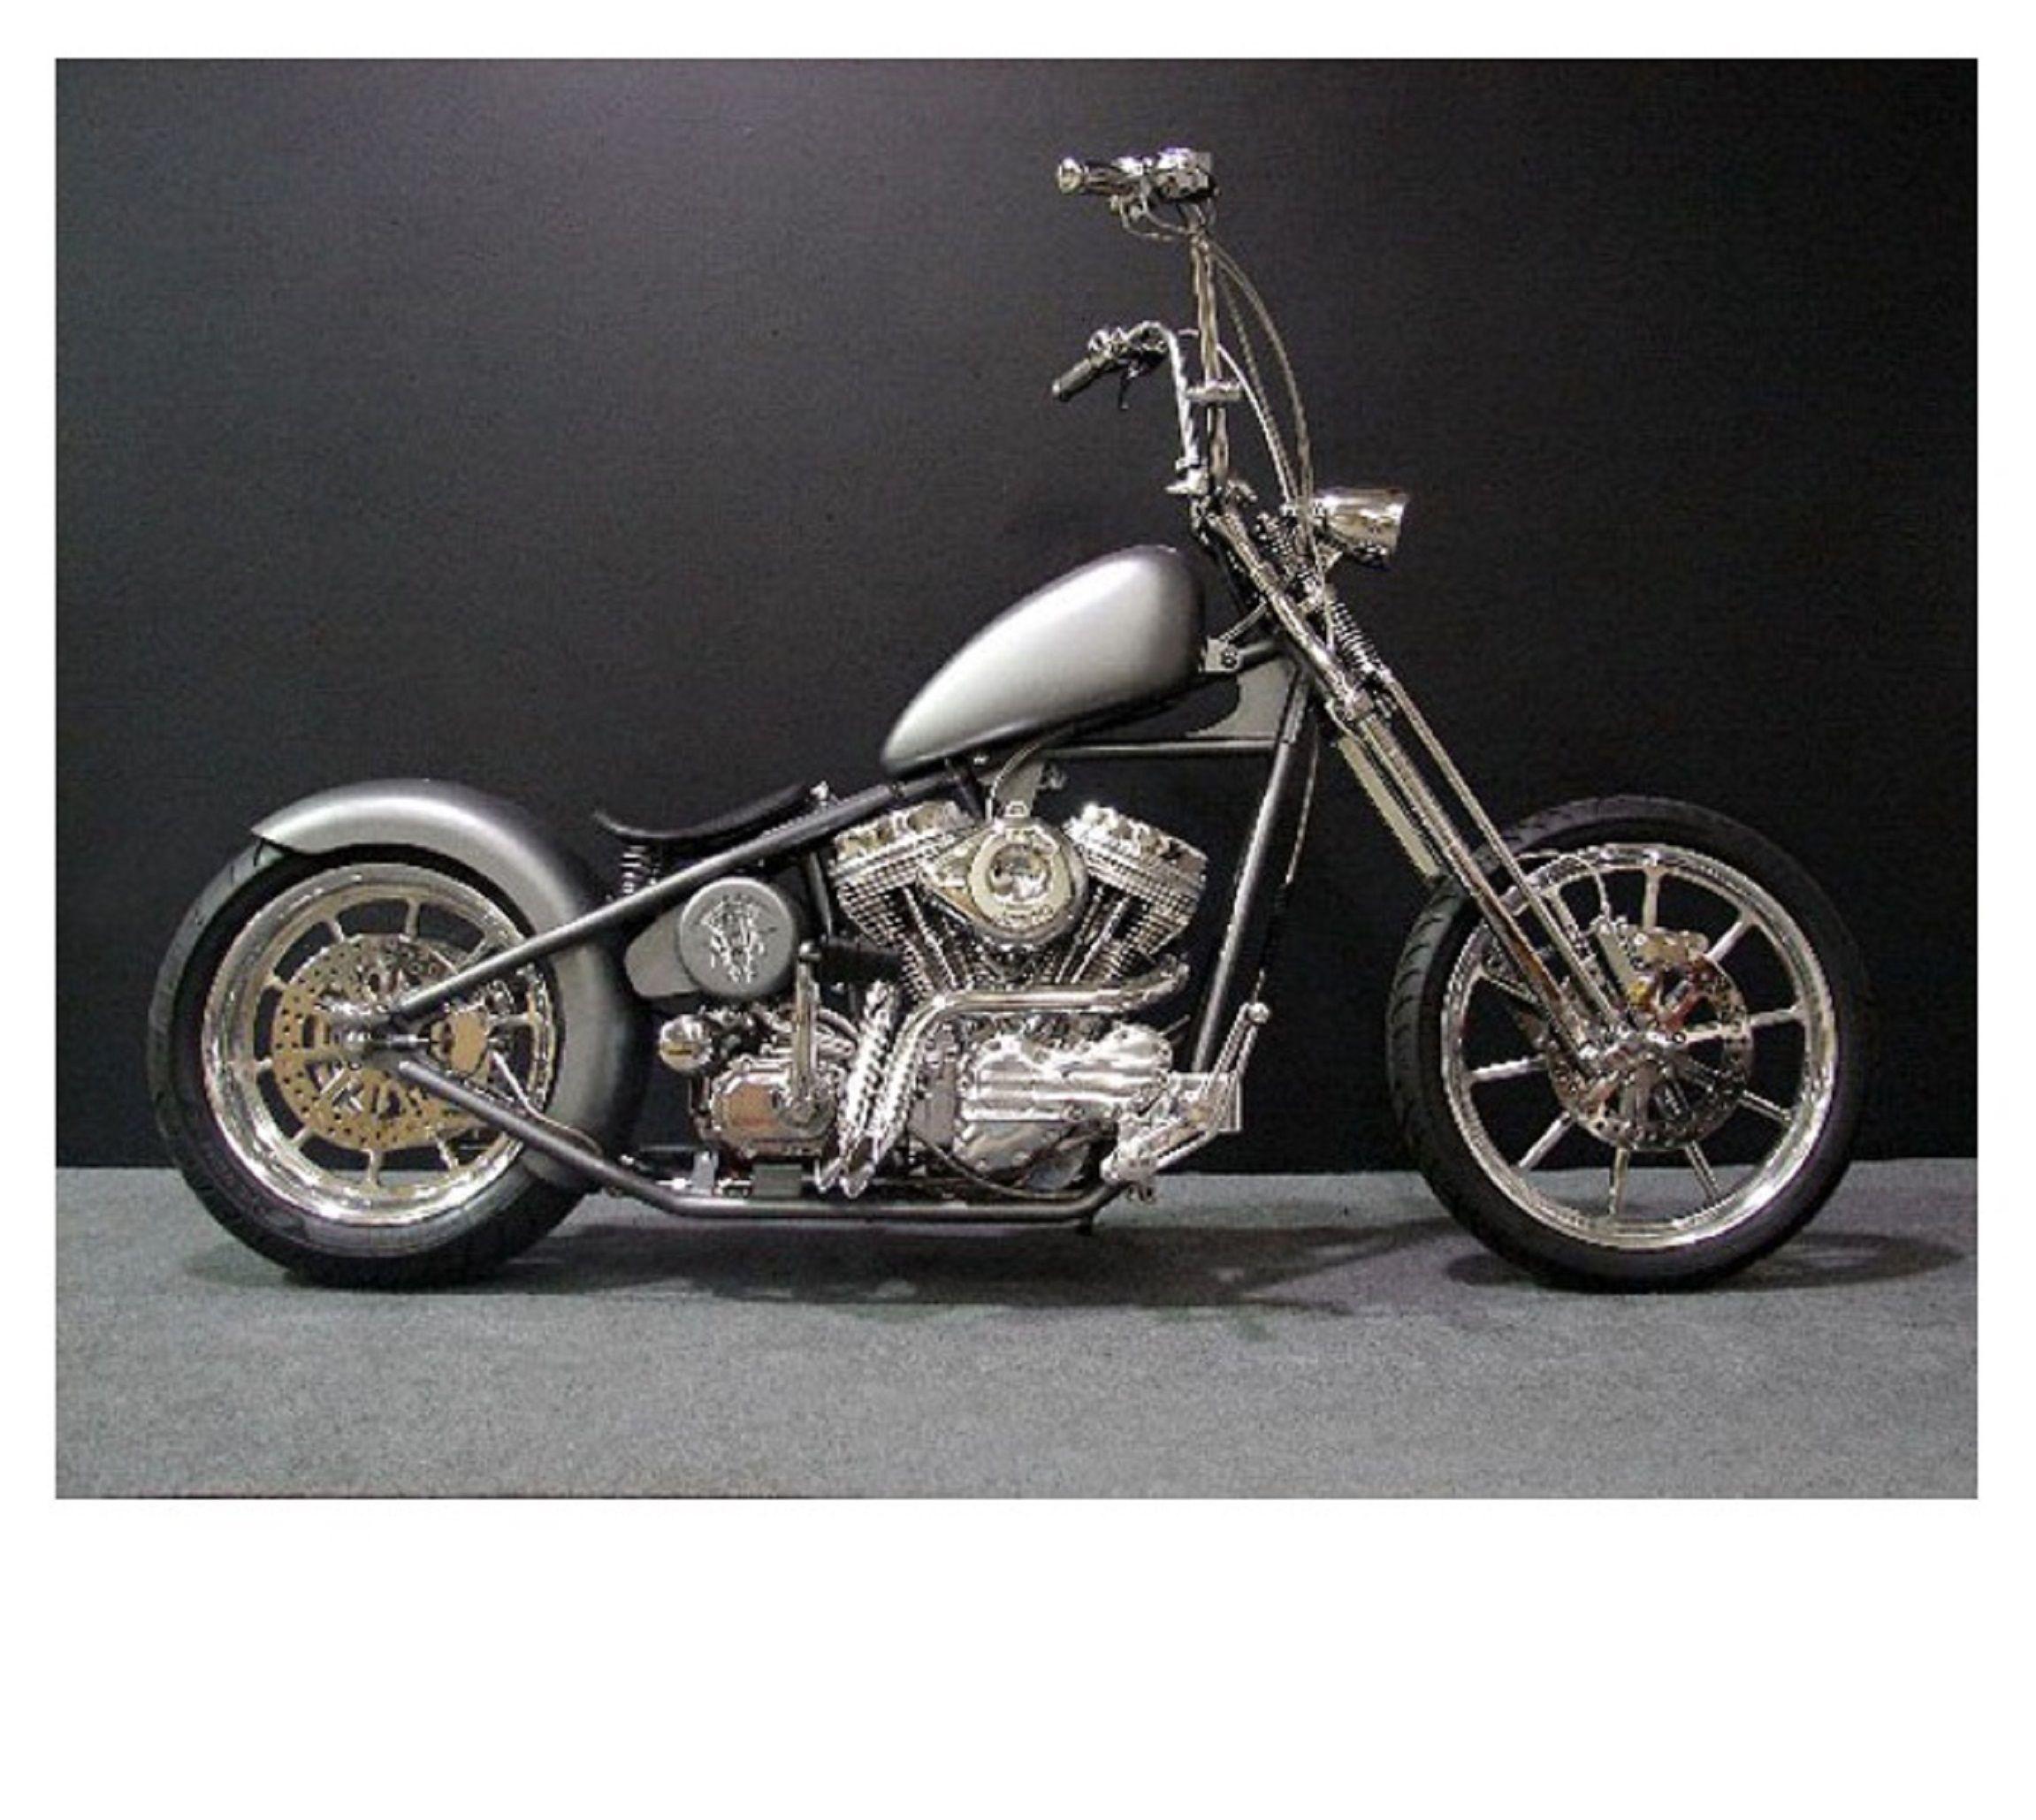 Pin by Wandering Soul on Hot Bikes | Chopper bike, Bobber motorcycle West Coast Chopper Wiring Harness on